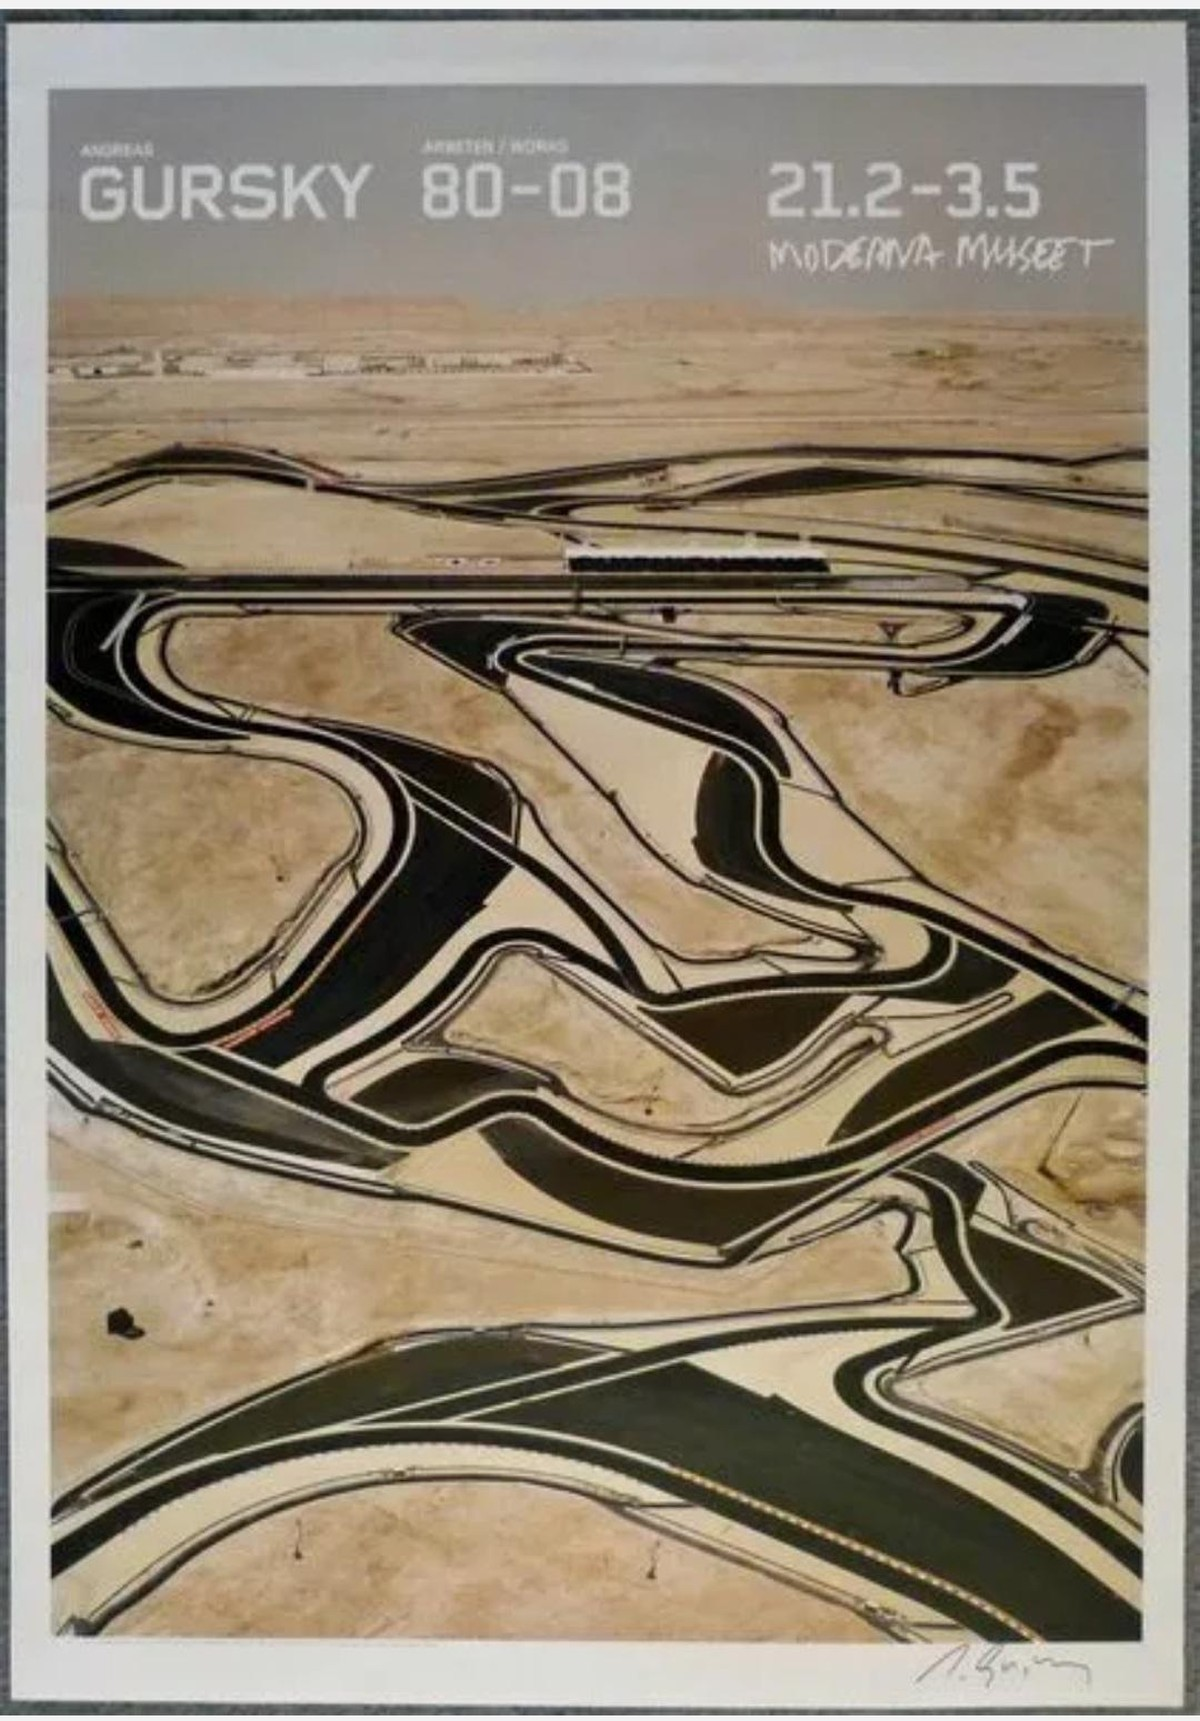 Andreas Gursky - Bahrain, Farboffset, signiert kopen? Bied vanaf 2000!